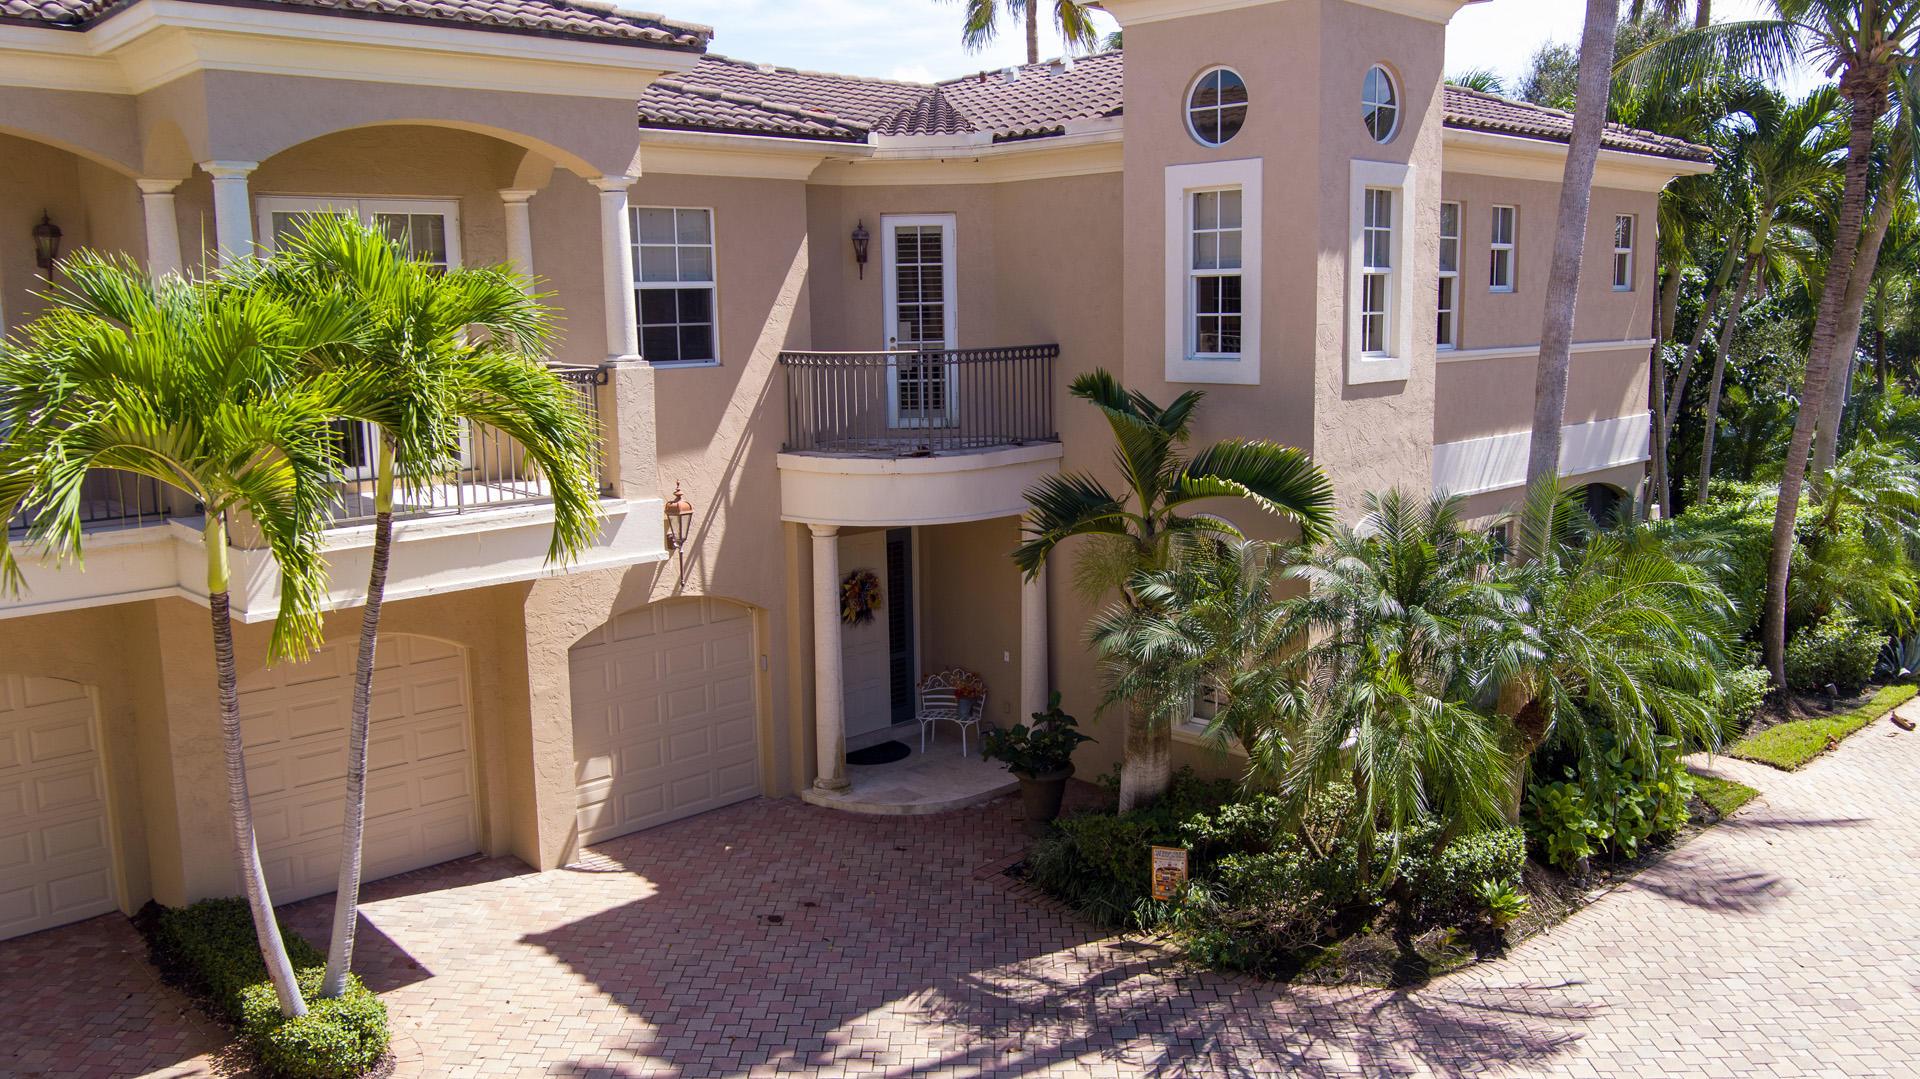 Photo of 1113 Highland Beach Drive, Highland Beach, FL 33487